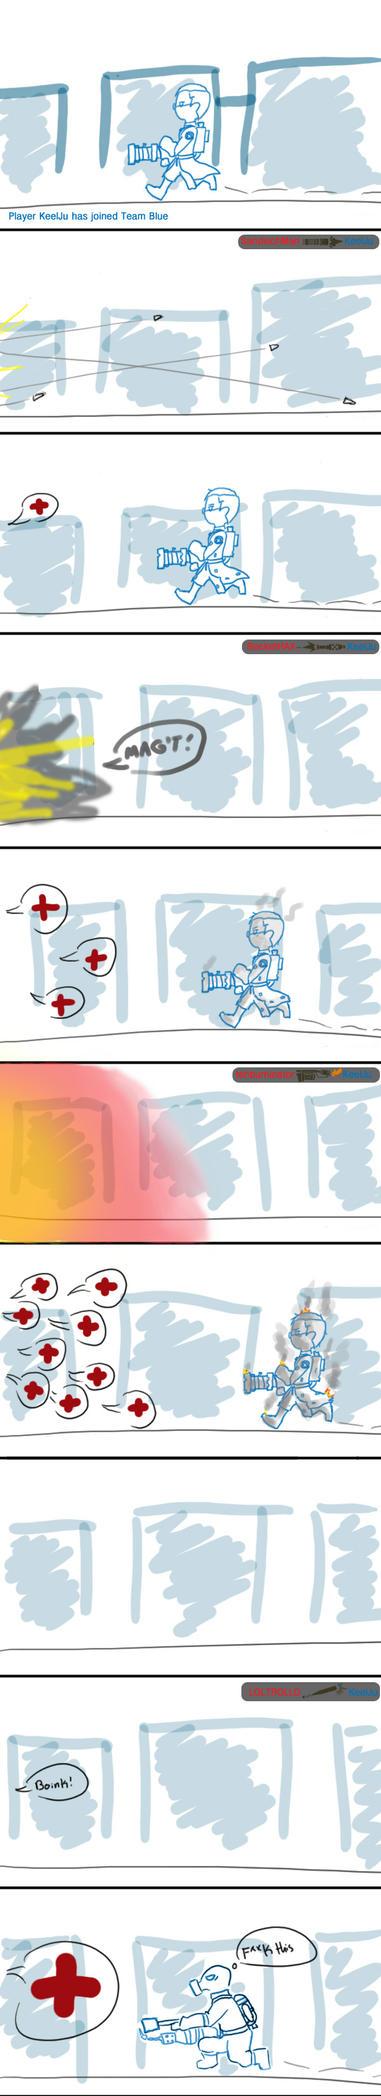 Medical Woes by ViciousMe